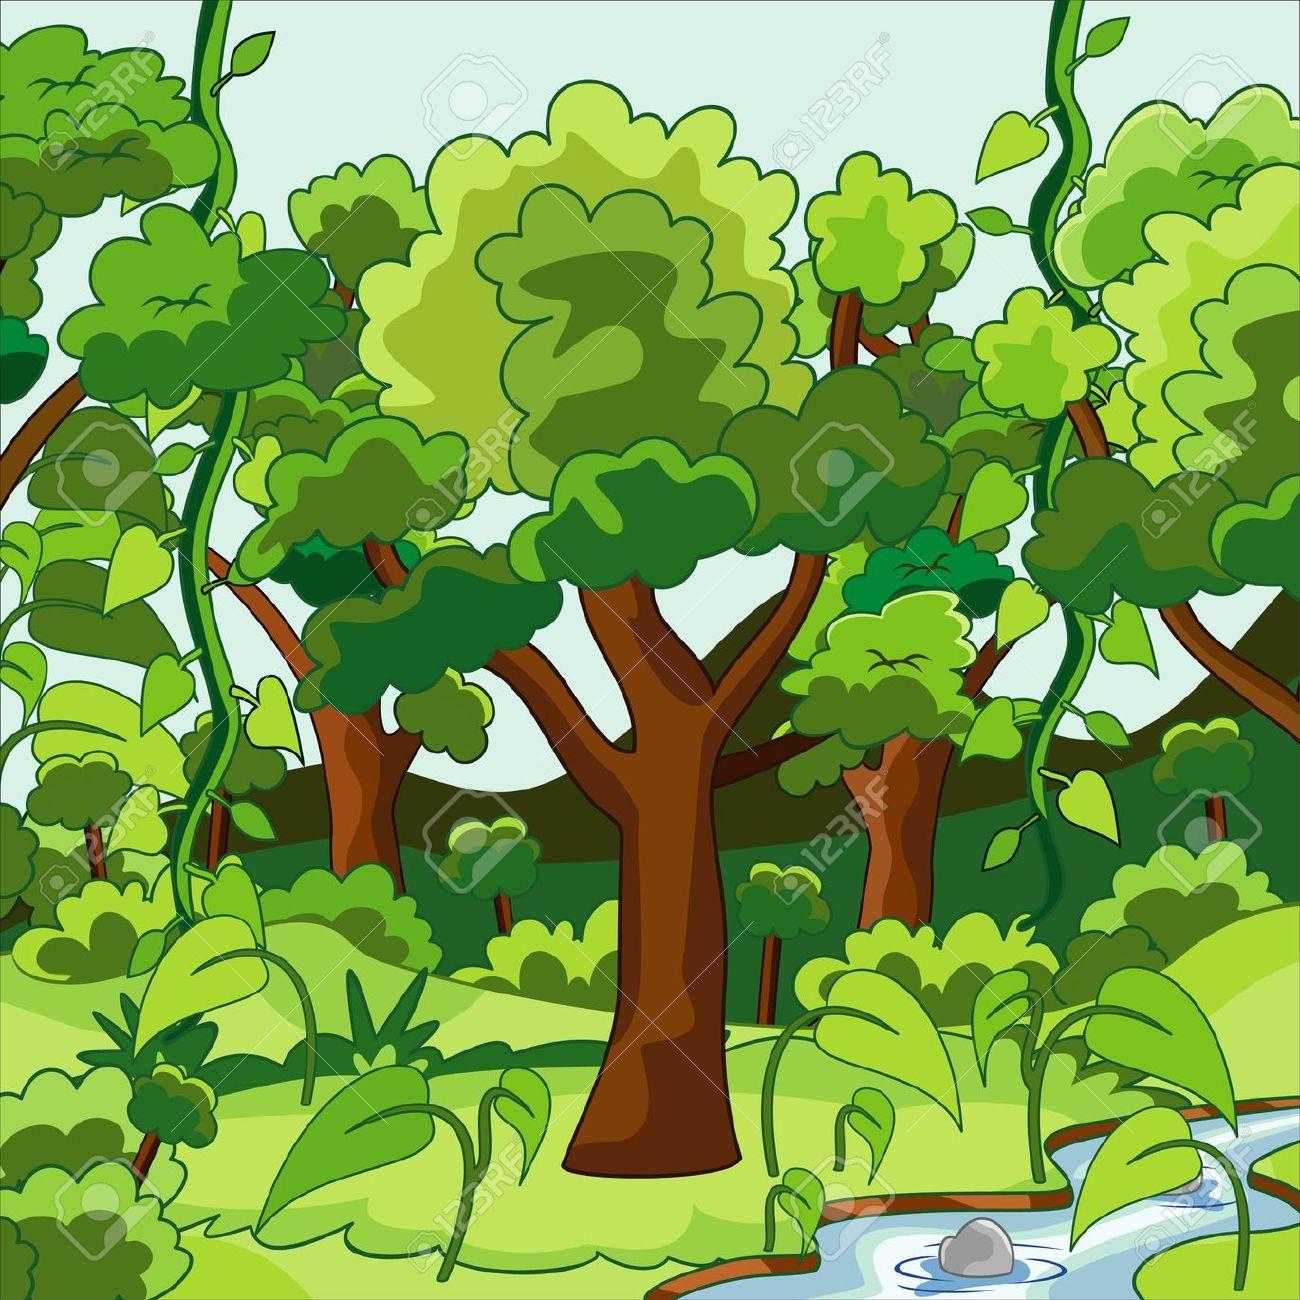 Free jungle clipart png transparent download Jungle Clip Art Free | Clipart Panda - Free Clipart Images png transparent download